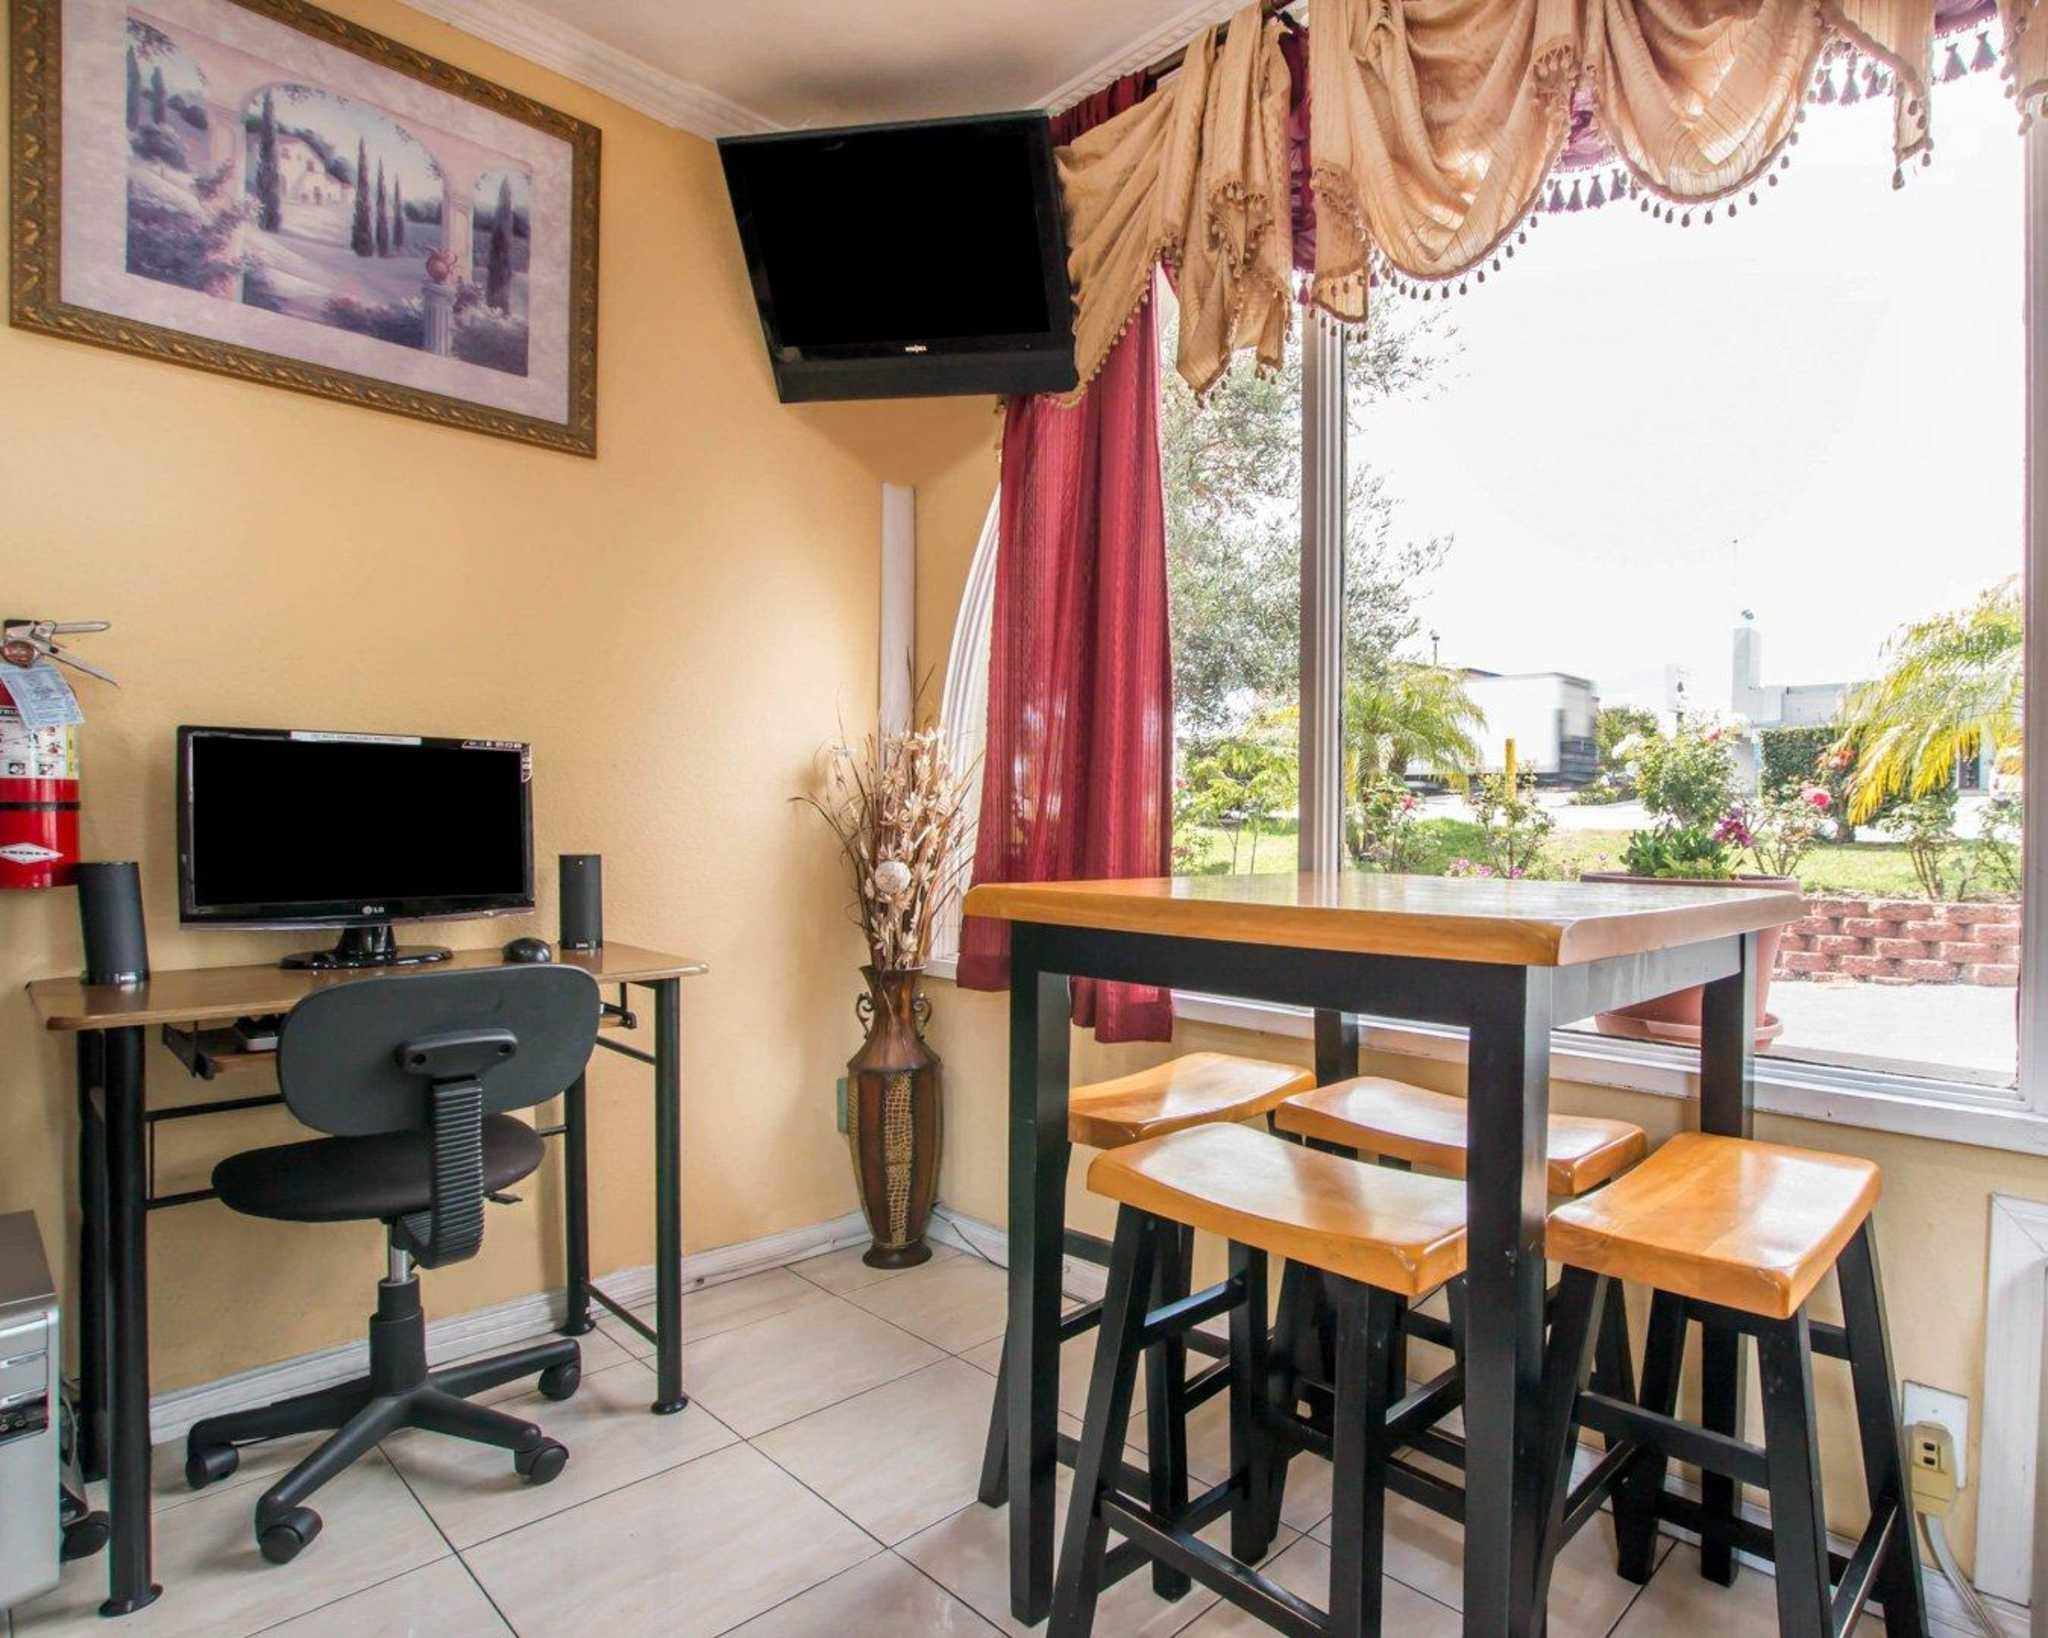 Rooms For Rent Lemon Grove Ca